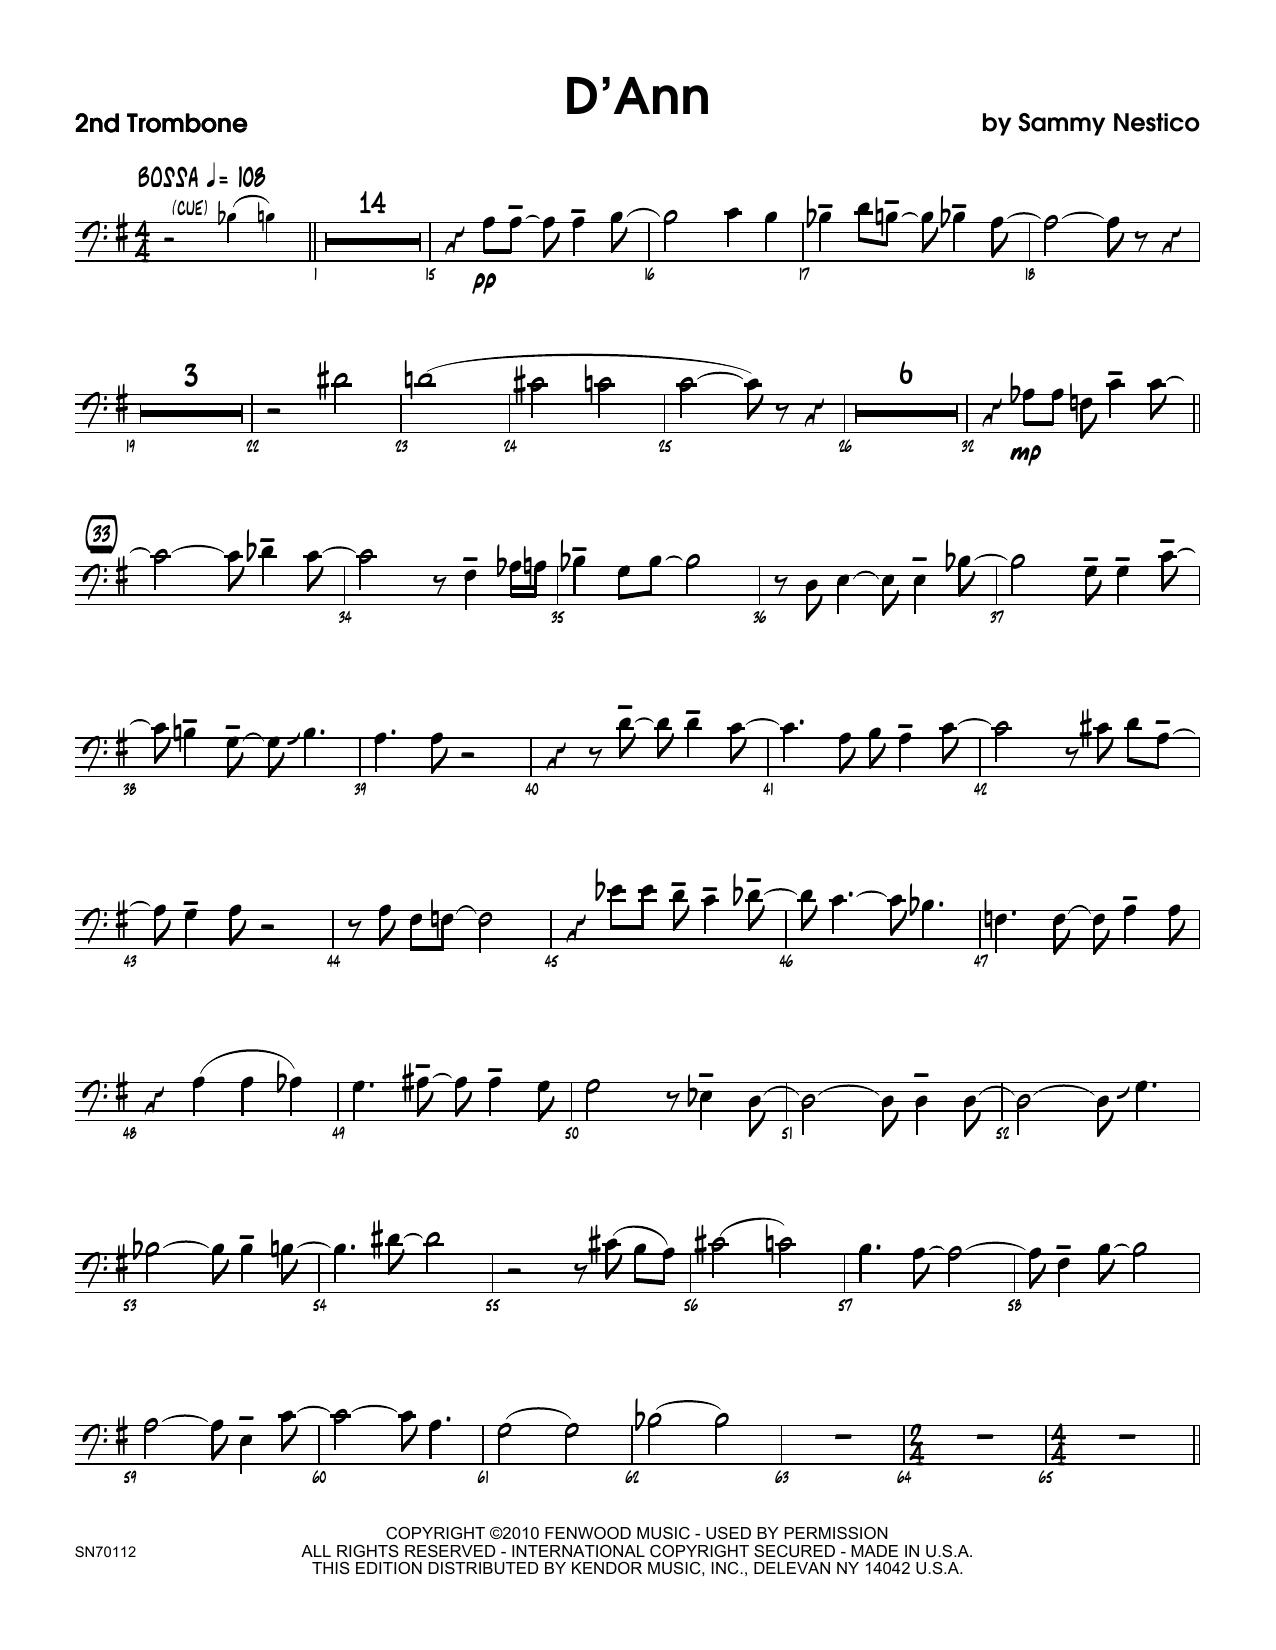 Sammy Nestico - D'Ann - 2nd Trombone